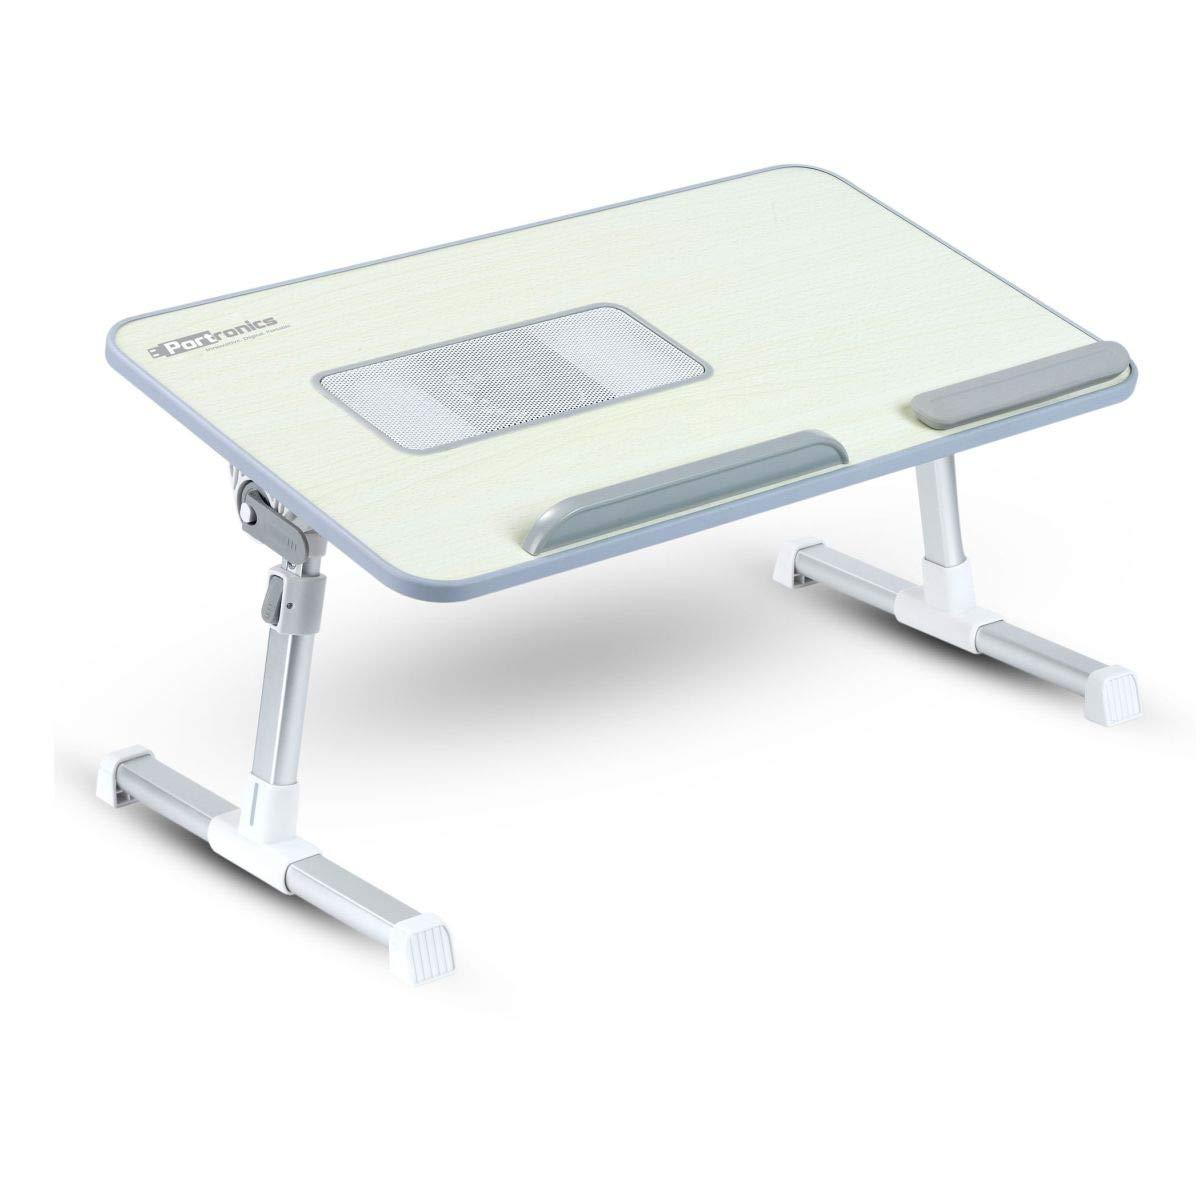 Portronics Por 704 Adjustable Laptop Table